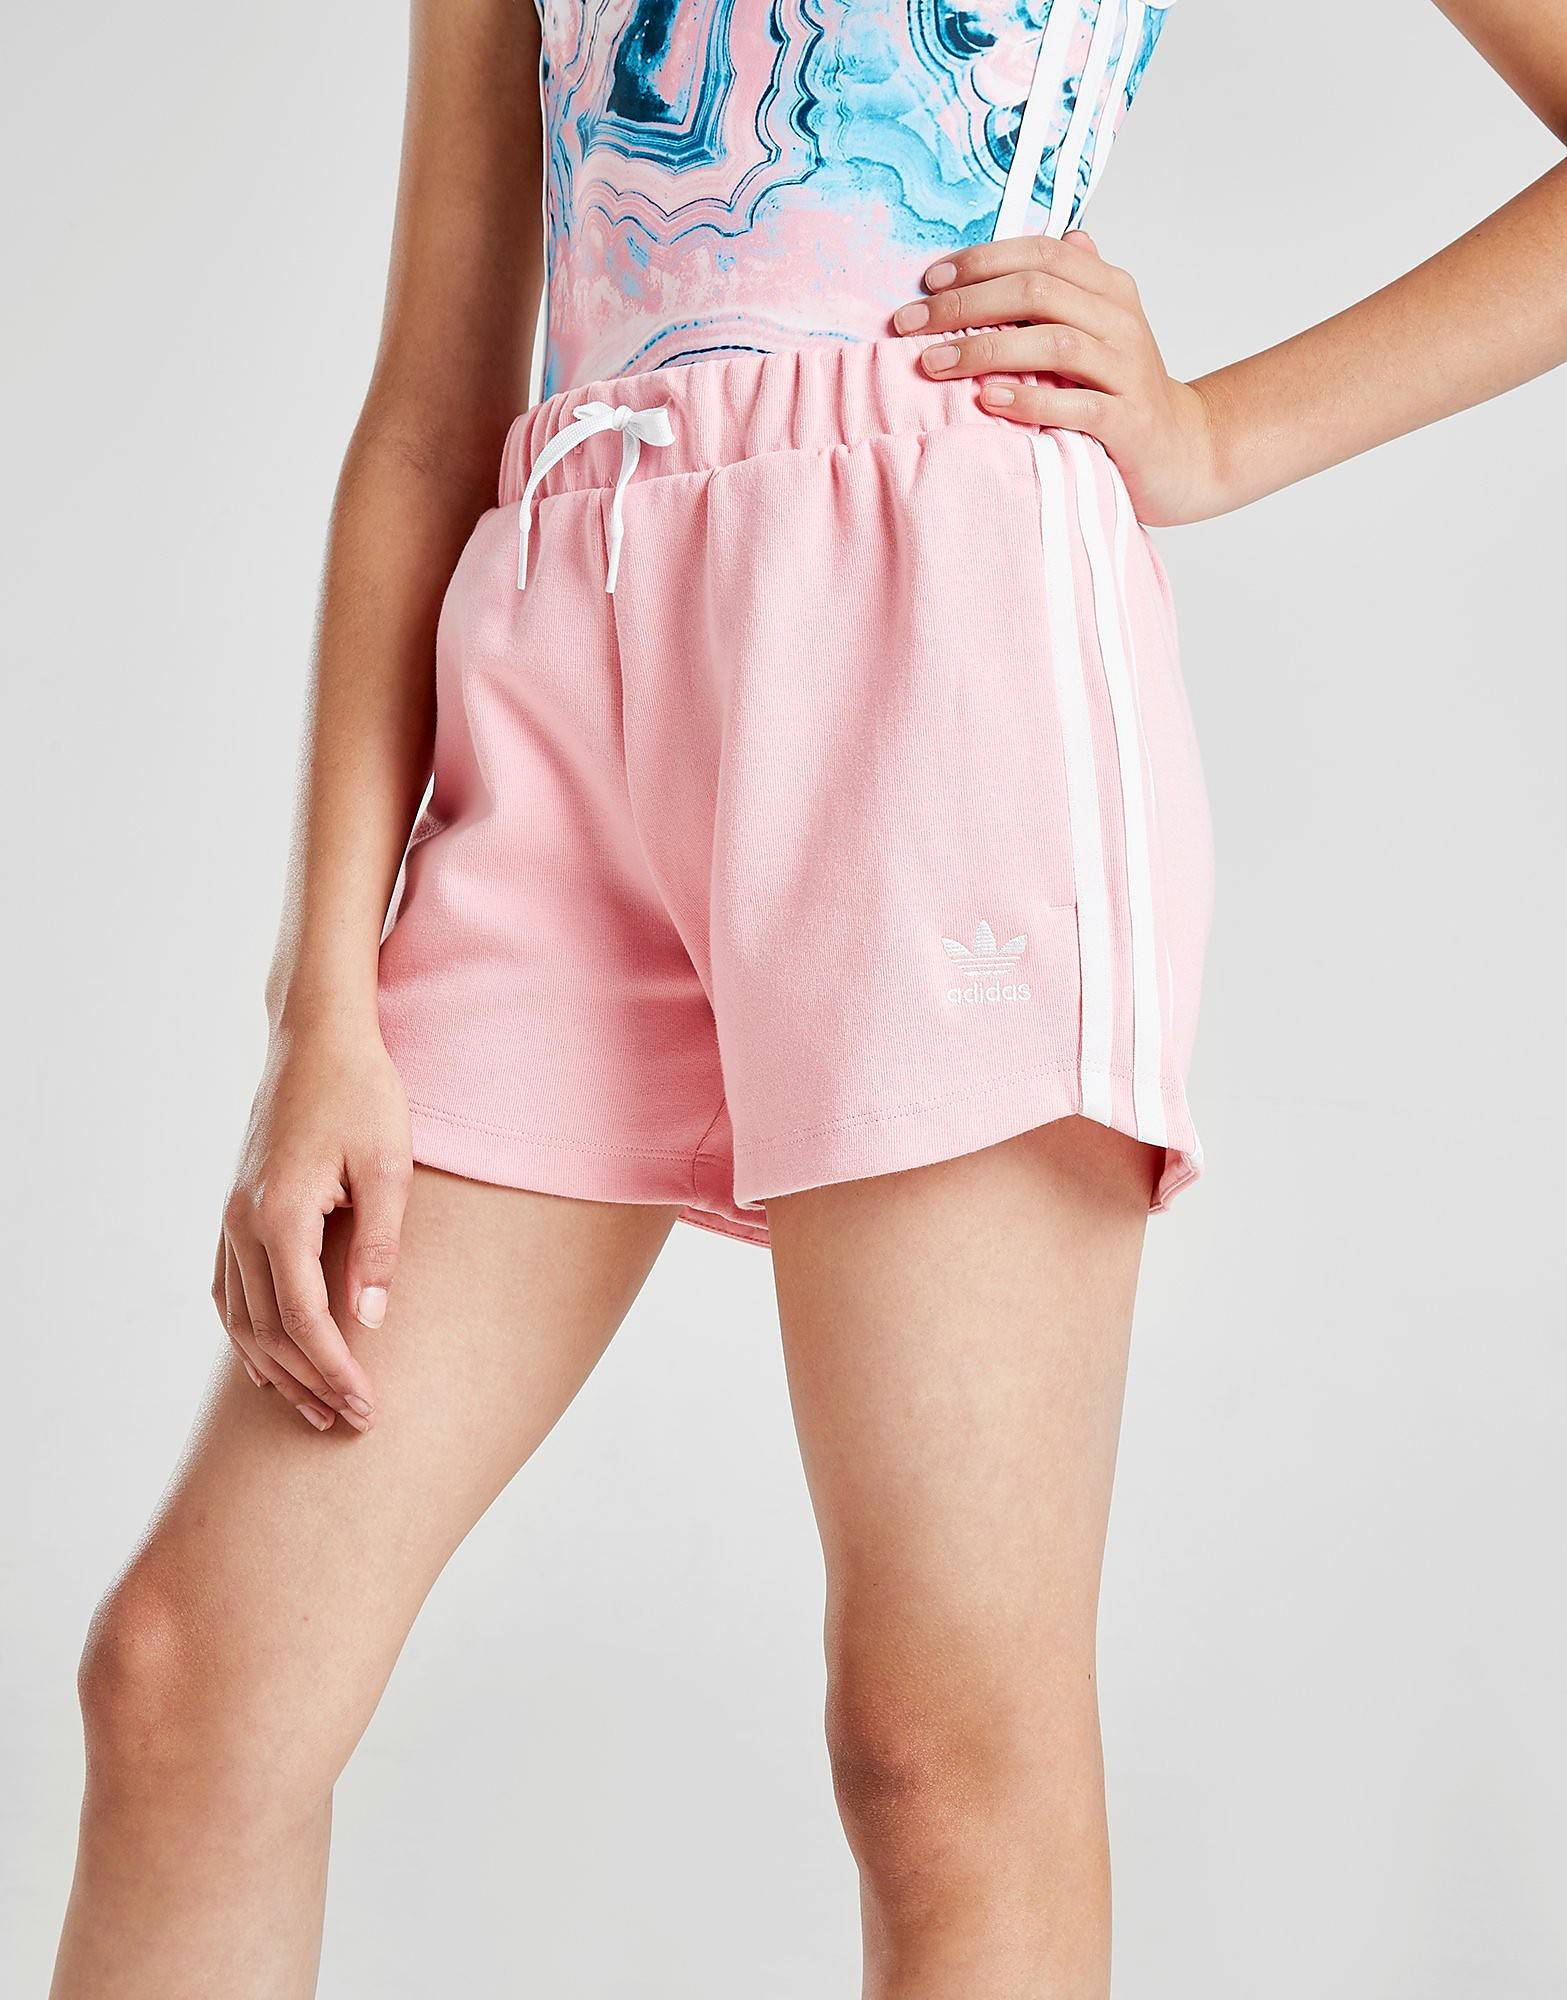 Image of Adidas Originals Girls' 3-Stripes Shorts Junior - Kids, Vaaleanpunainen